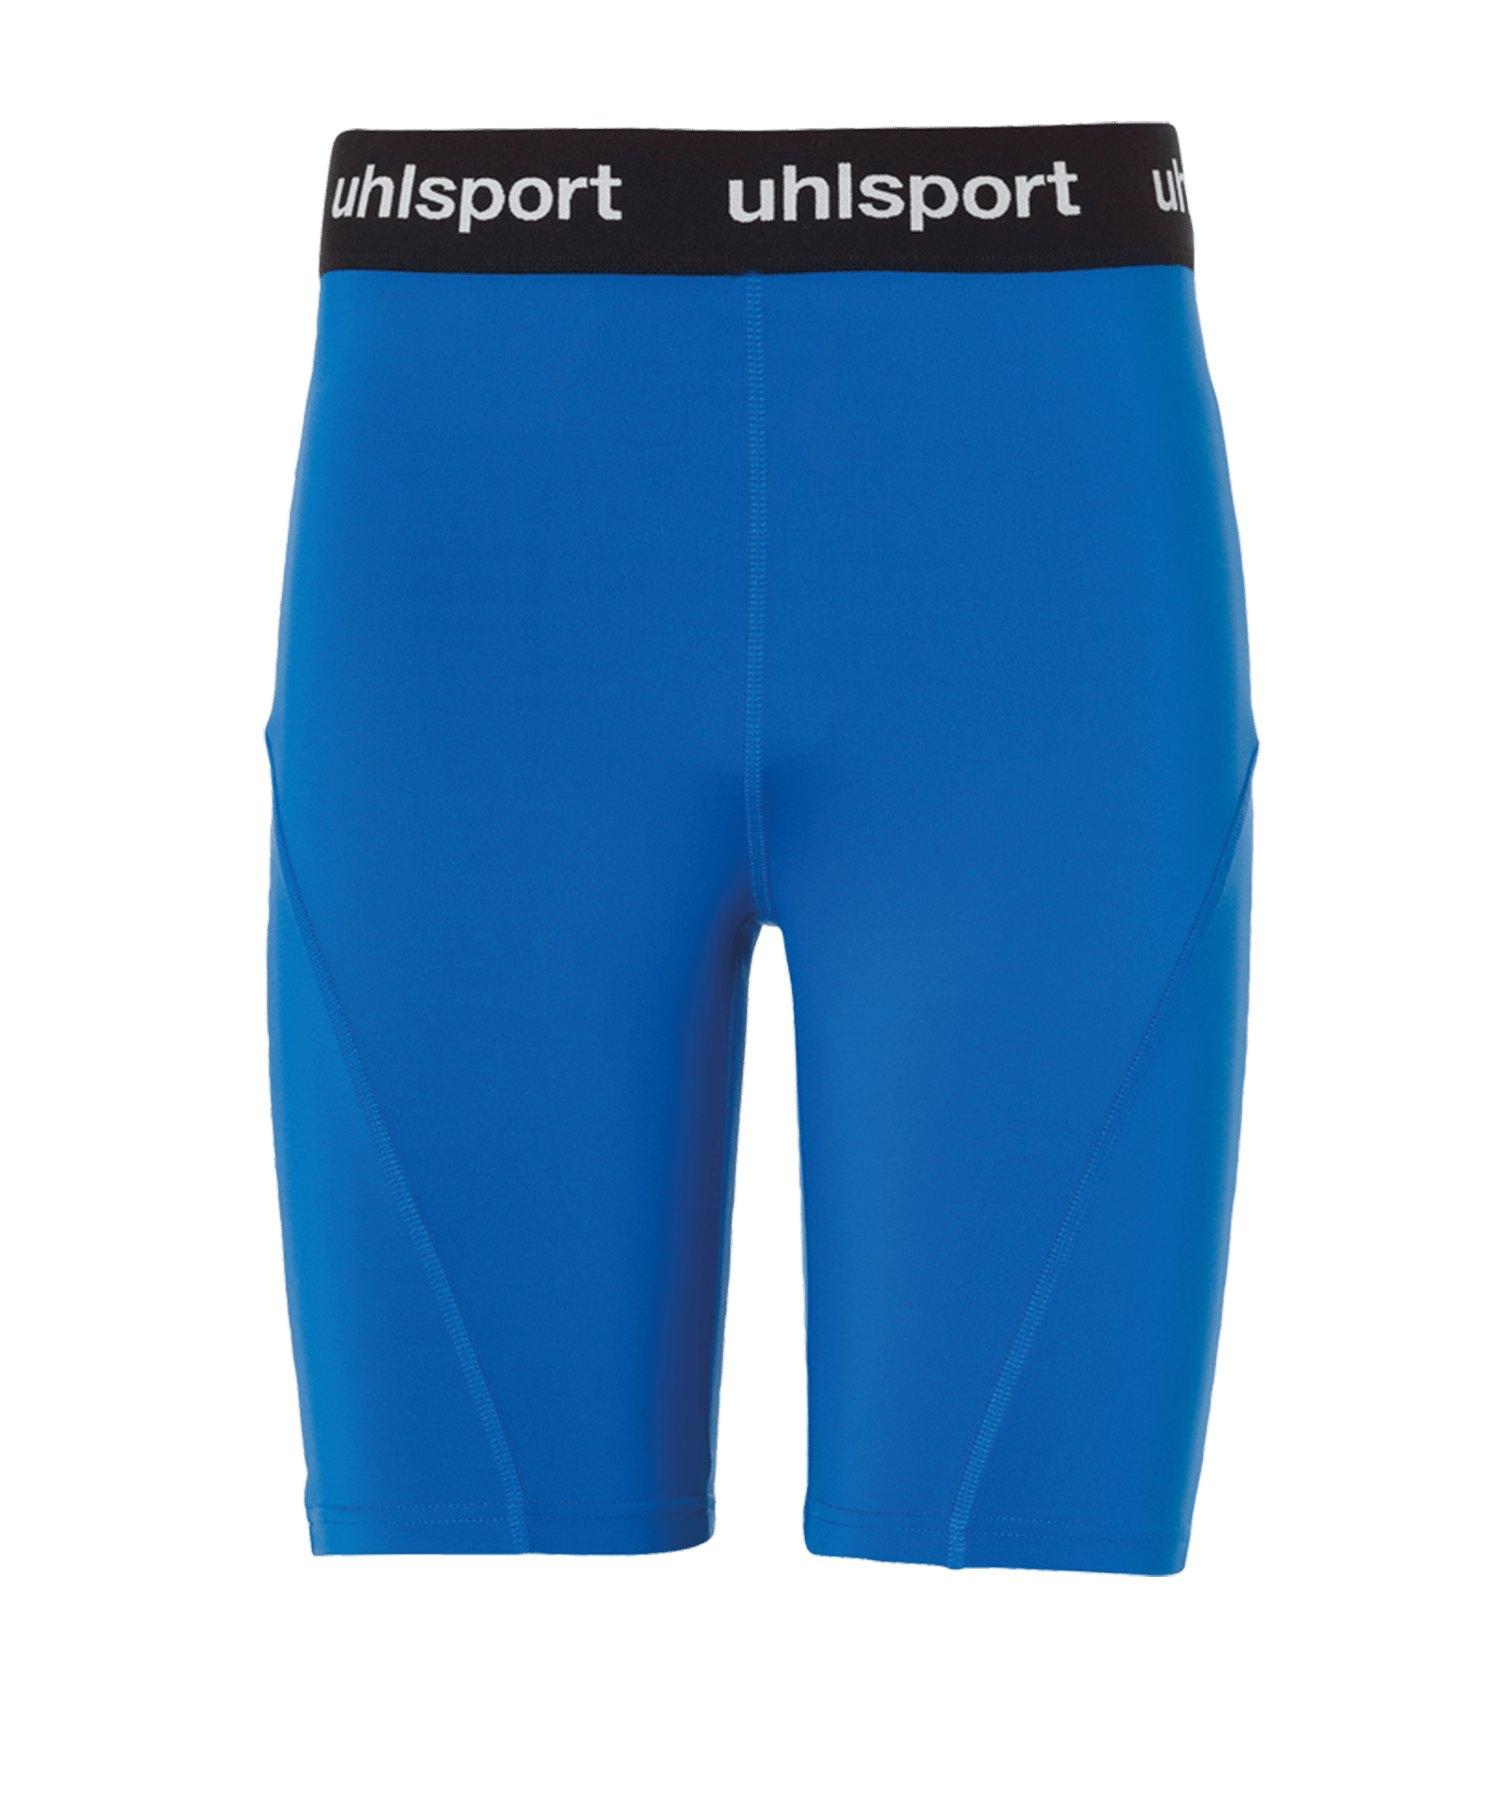 Uhlsport Tight Short Hose kurz Blau F03 - blau